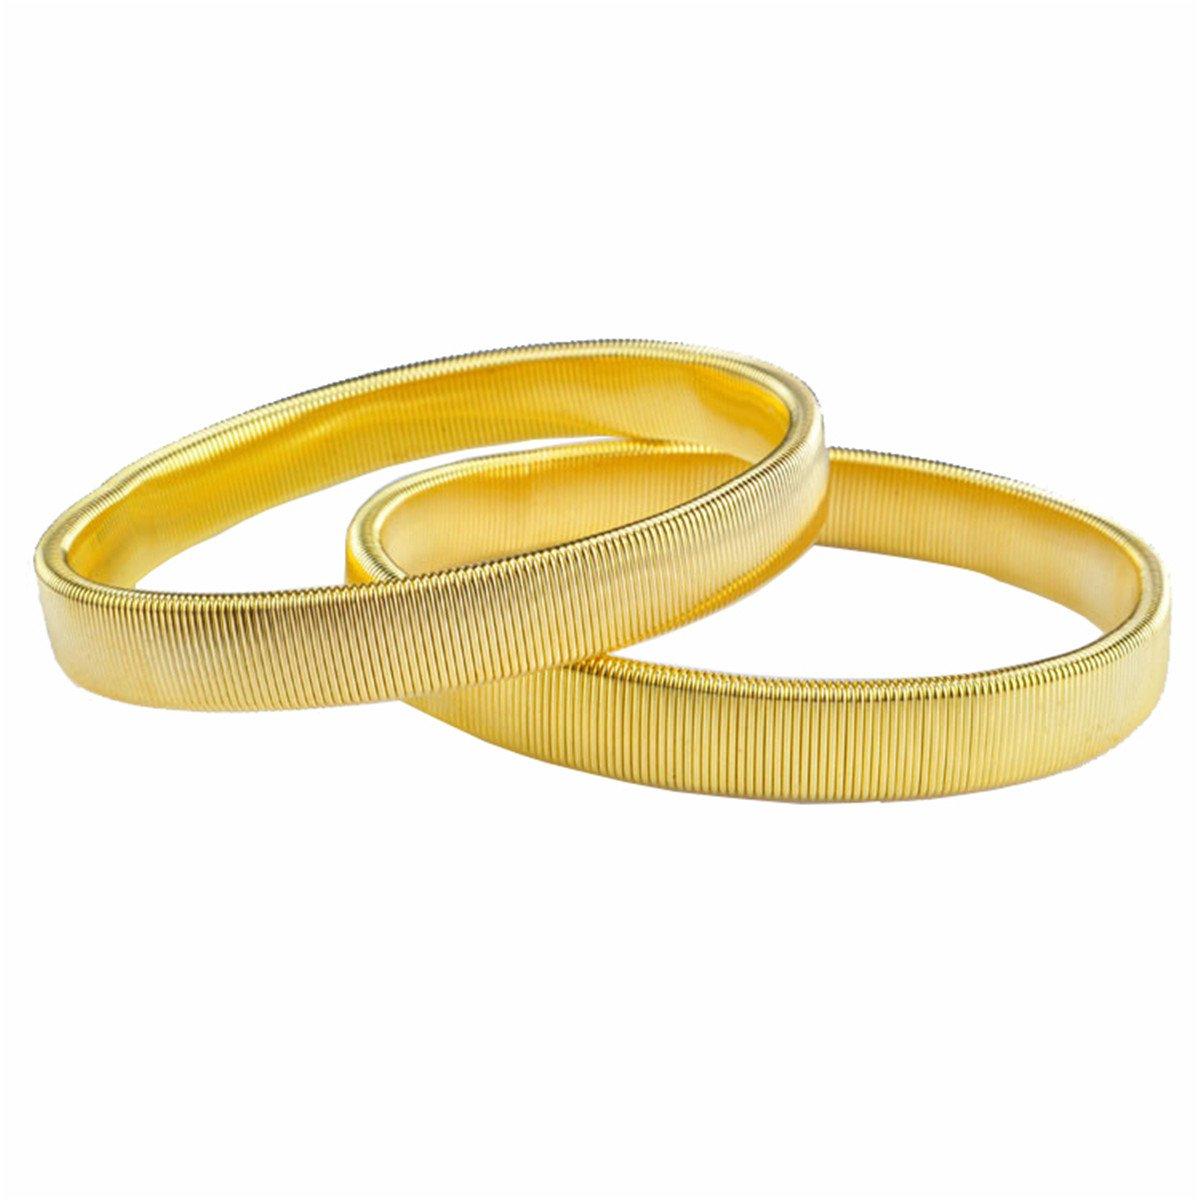 Verstellbare Elastische Metall Ärmel Hemd Armbänder Inhaber Golden